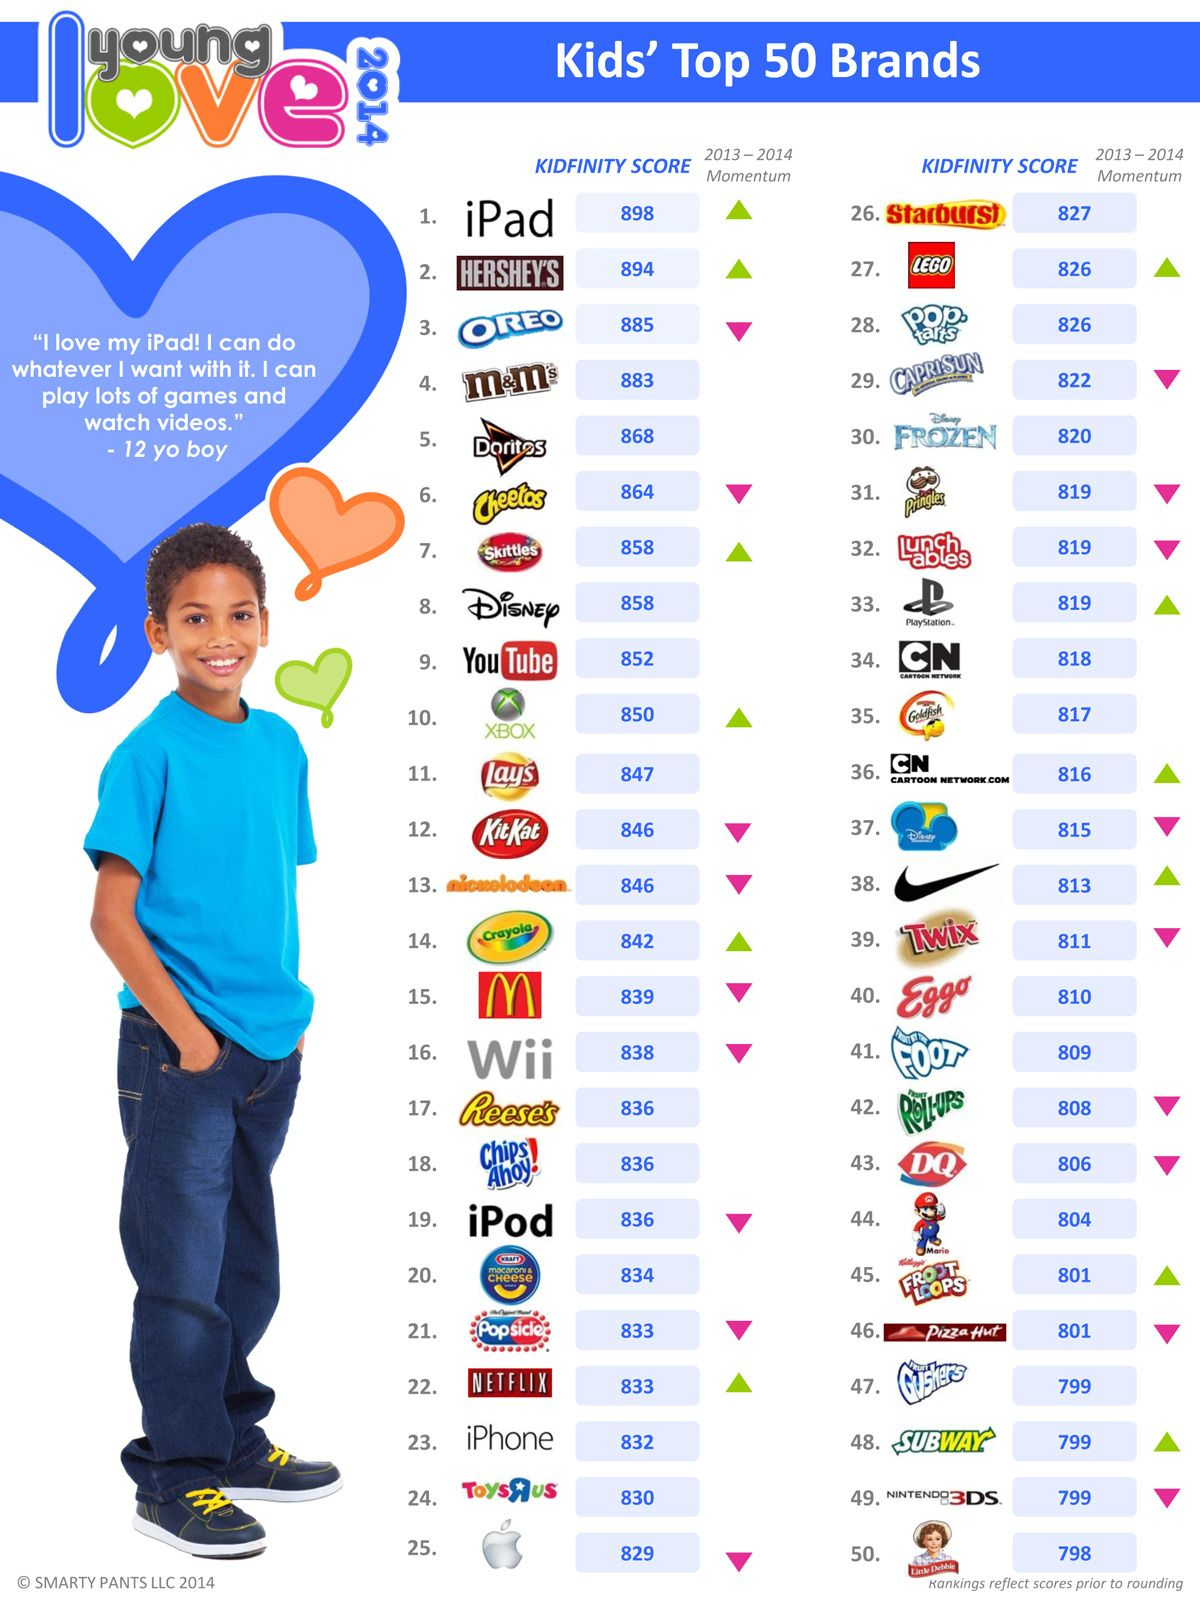 Kids Top 50 Brands List 2014.Foto: Smarty Pants